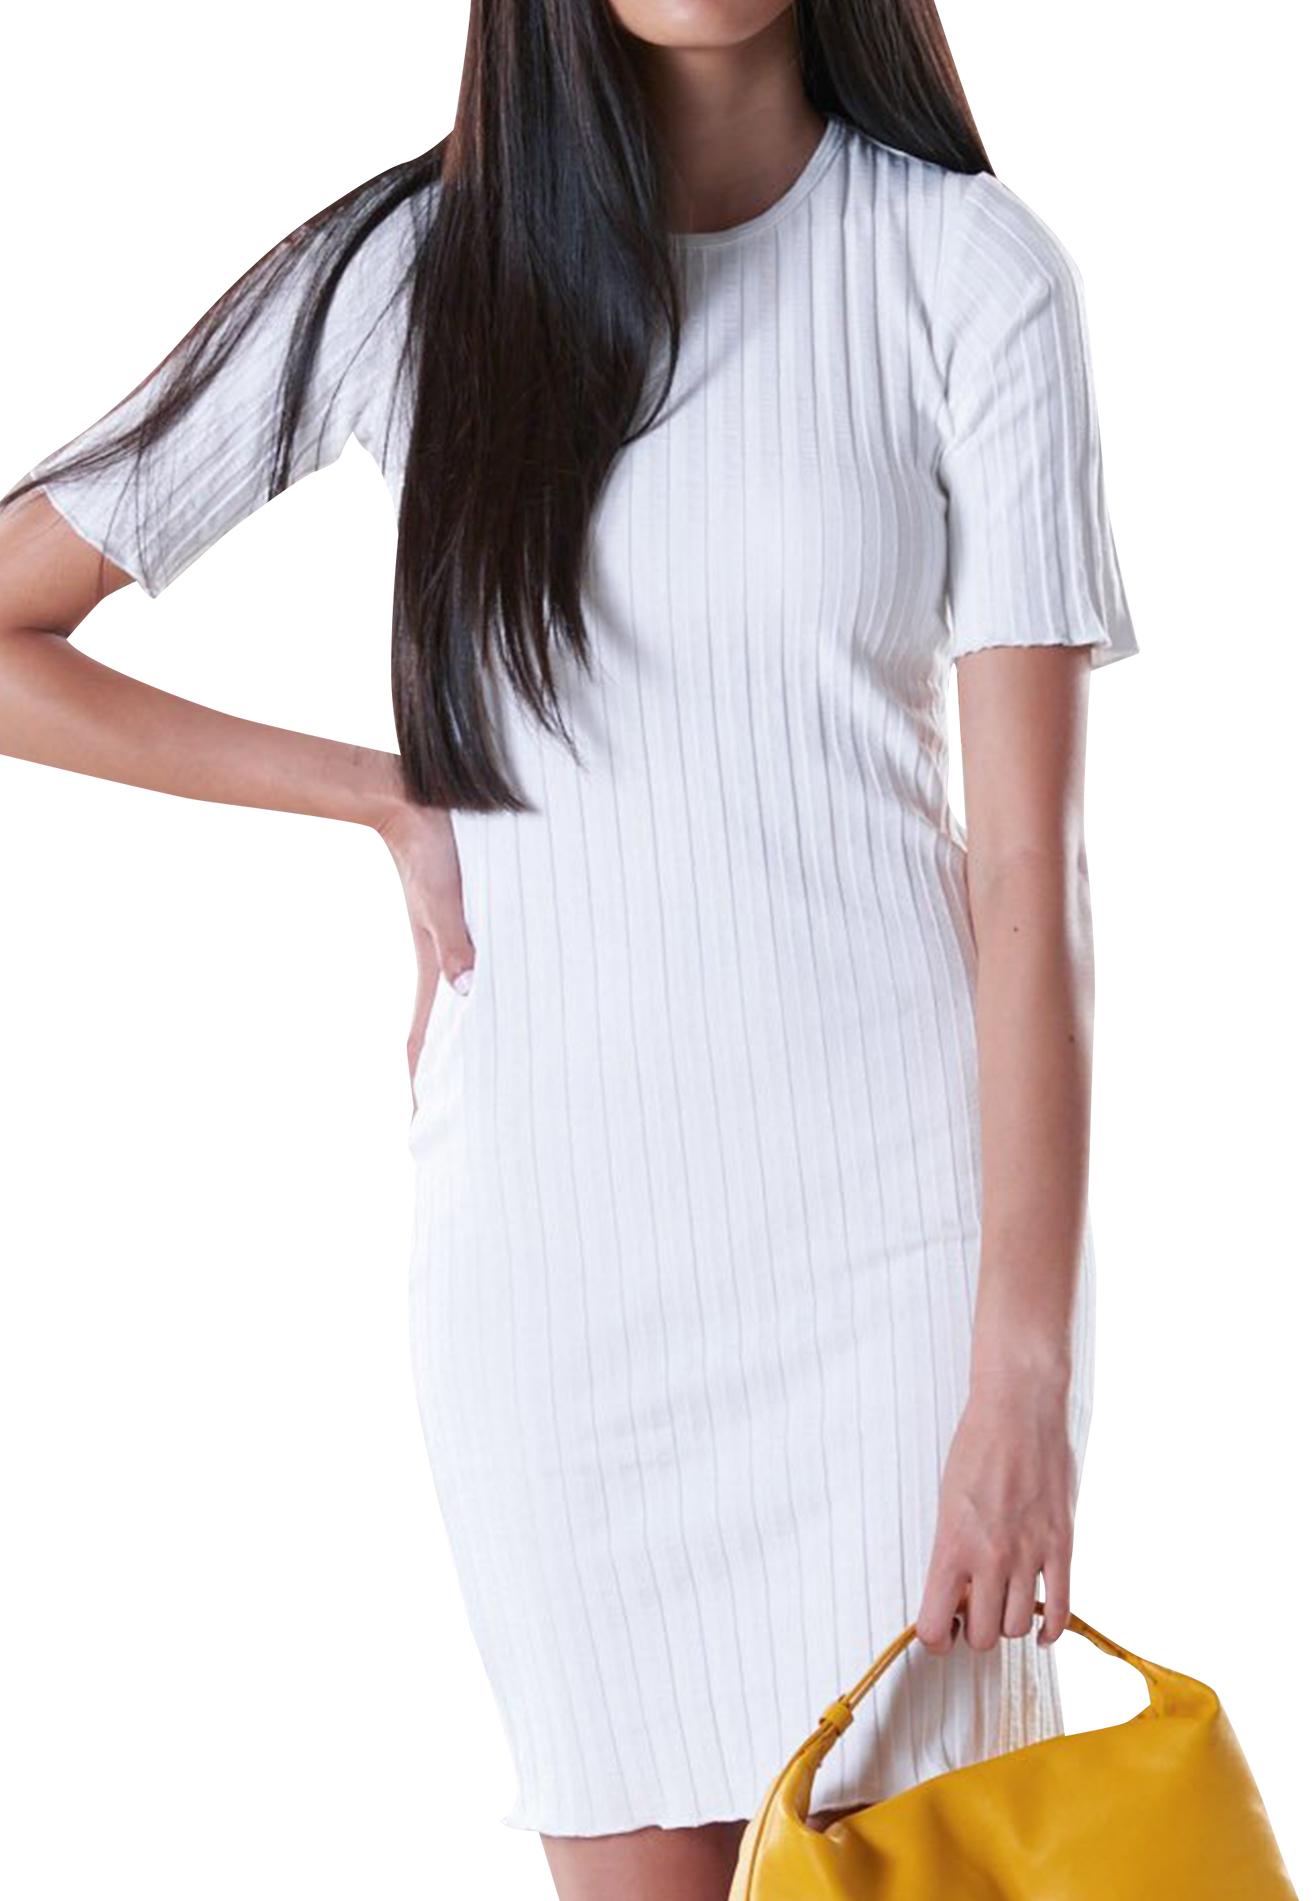 RIB Capo Short Dress in Macadamia by Simon Miller - 1